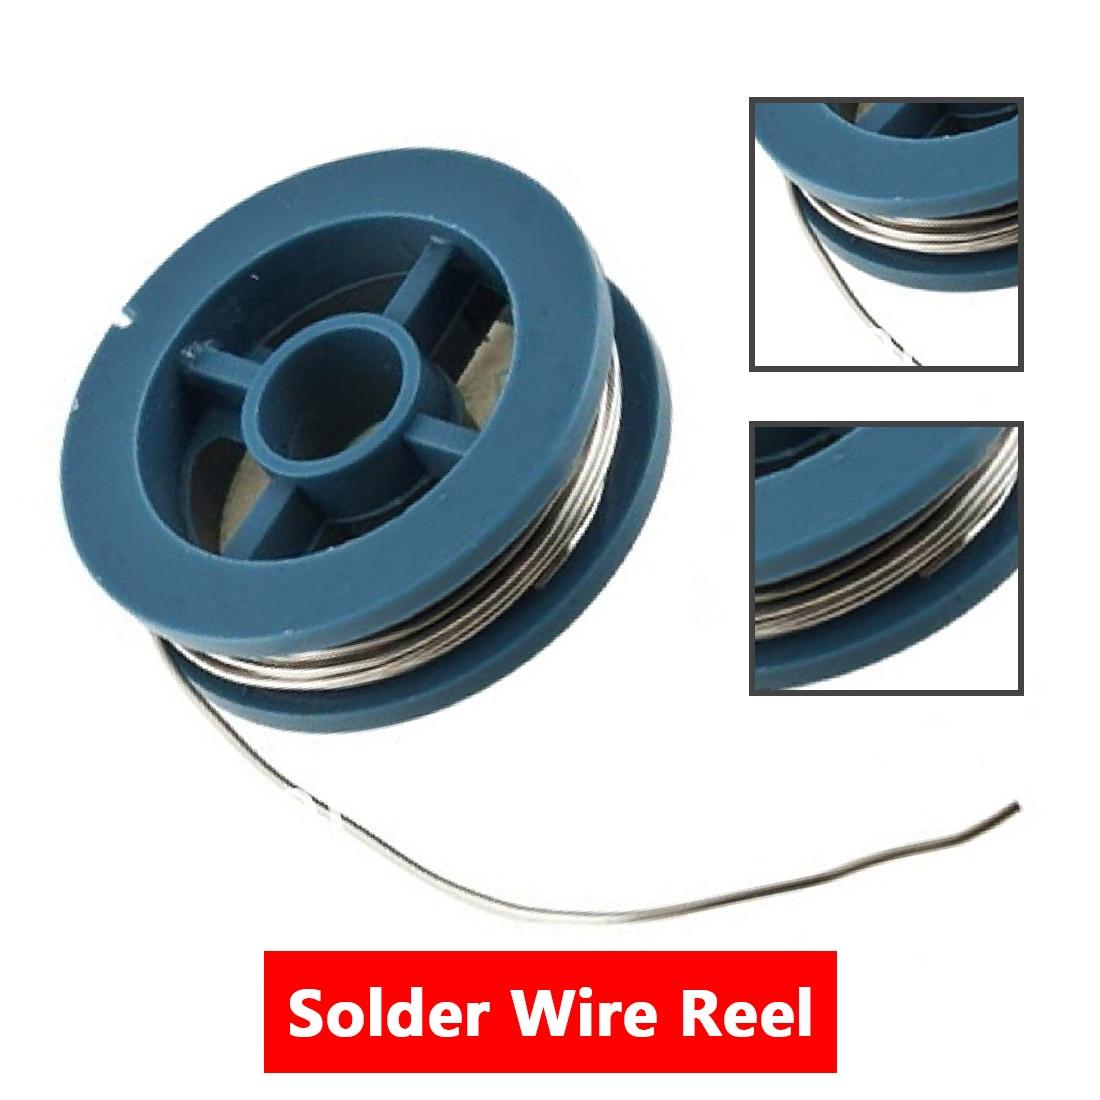 361f/183c Melting Point 1.7m 0.8mm Tin Rosin Core Tin/Lead Rosin Roll Flux Solder Wire Reel